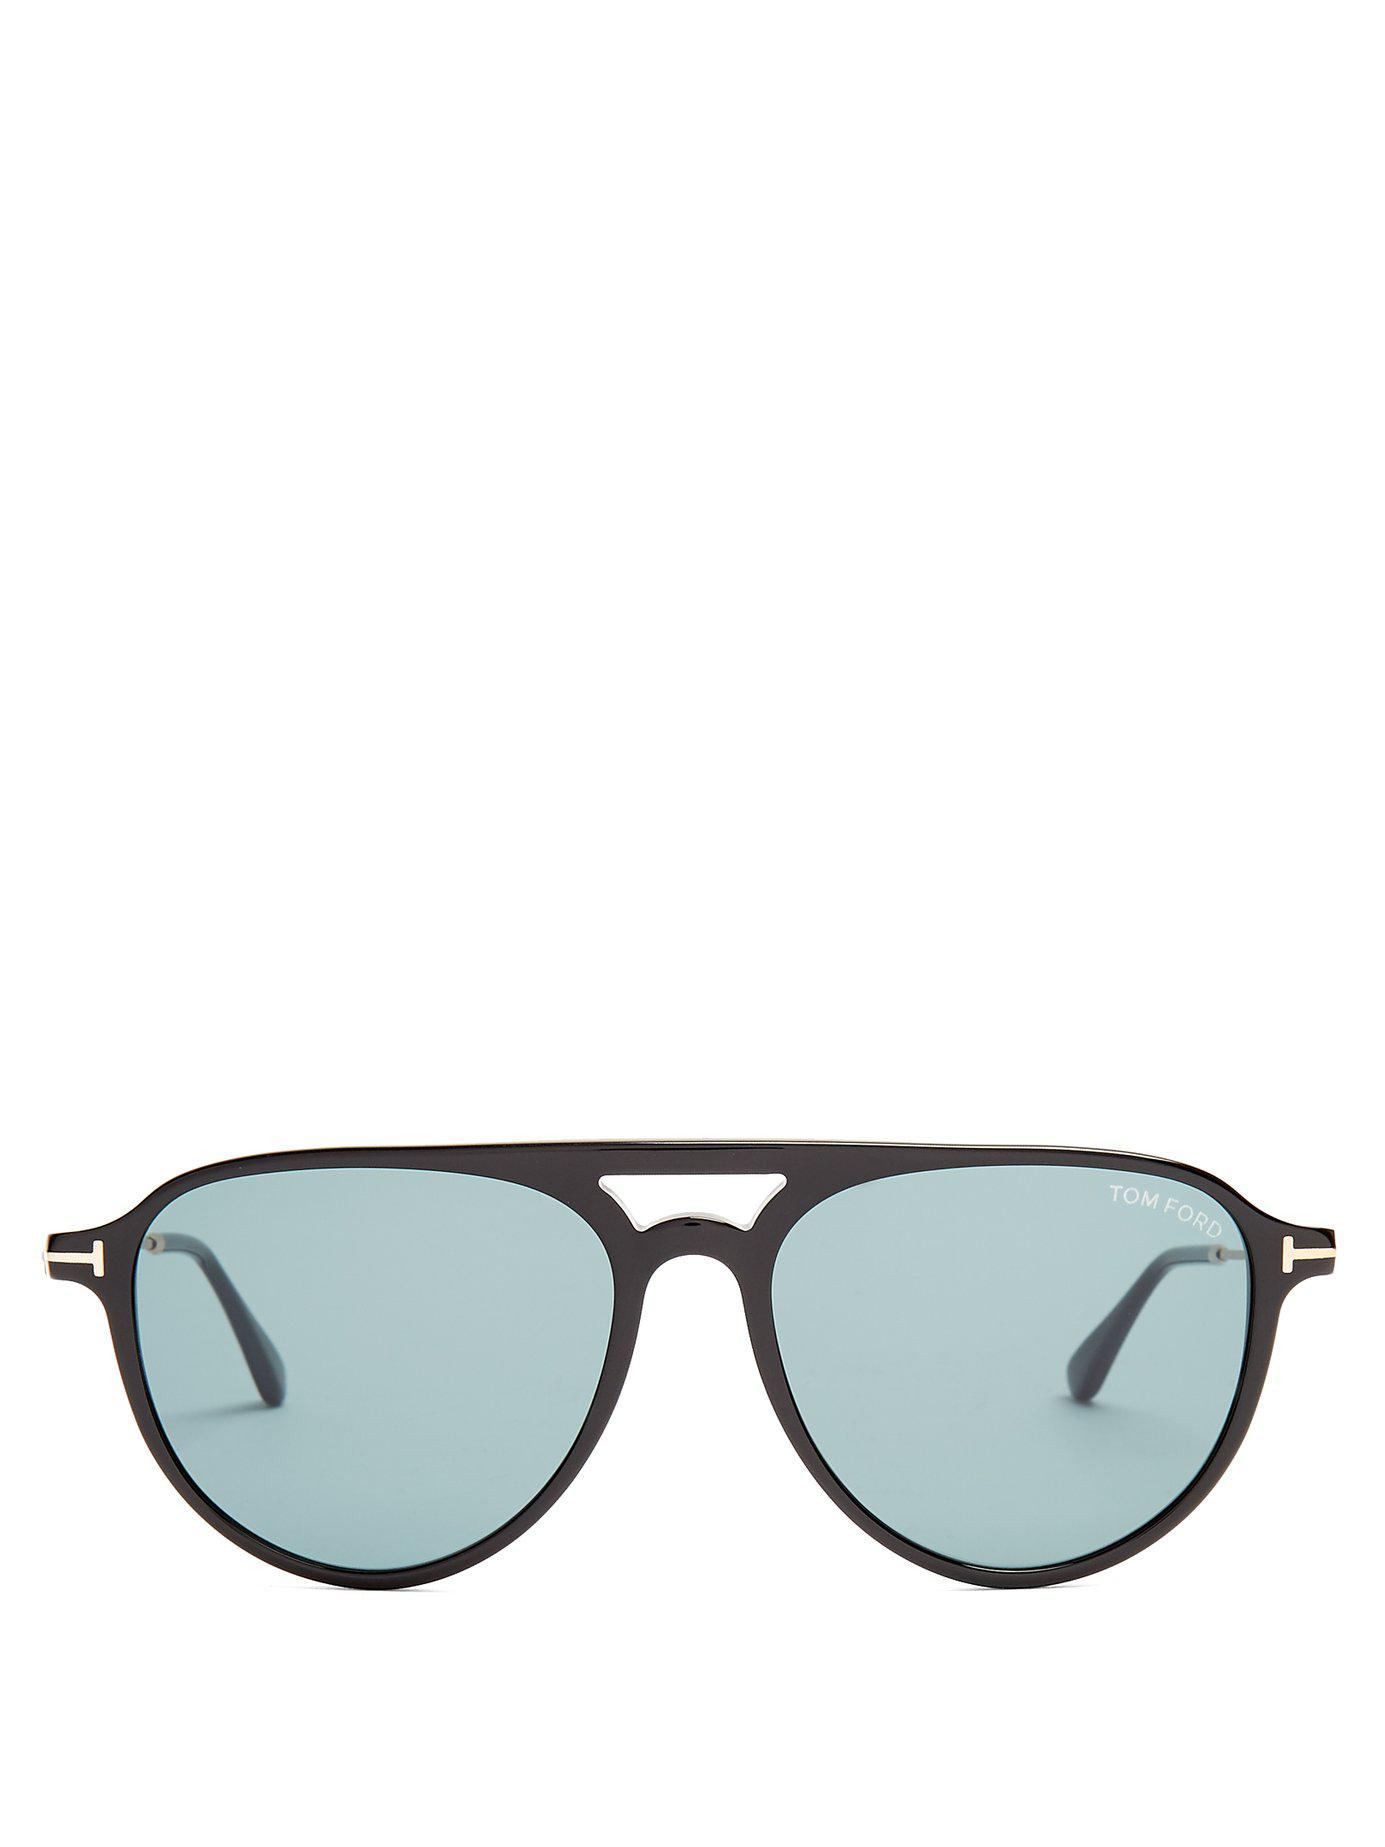 10c39d5c8f8 Tom Ford - Black Carlo Aviator Acetate Sunglasses for Men - Lyst. View  fullscreen